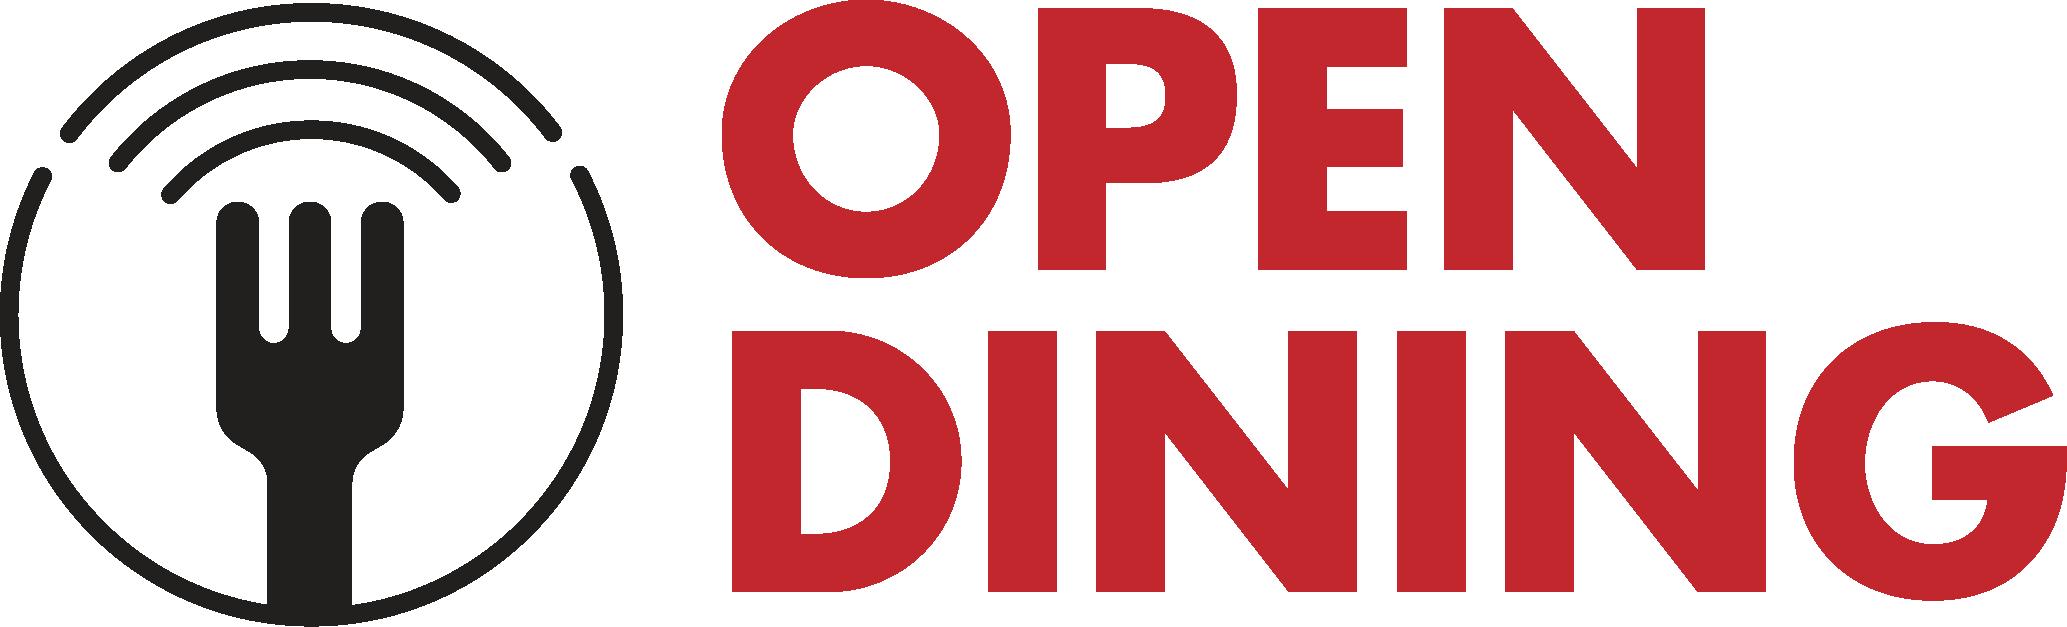 Open Dining logo